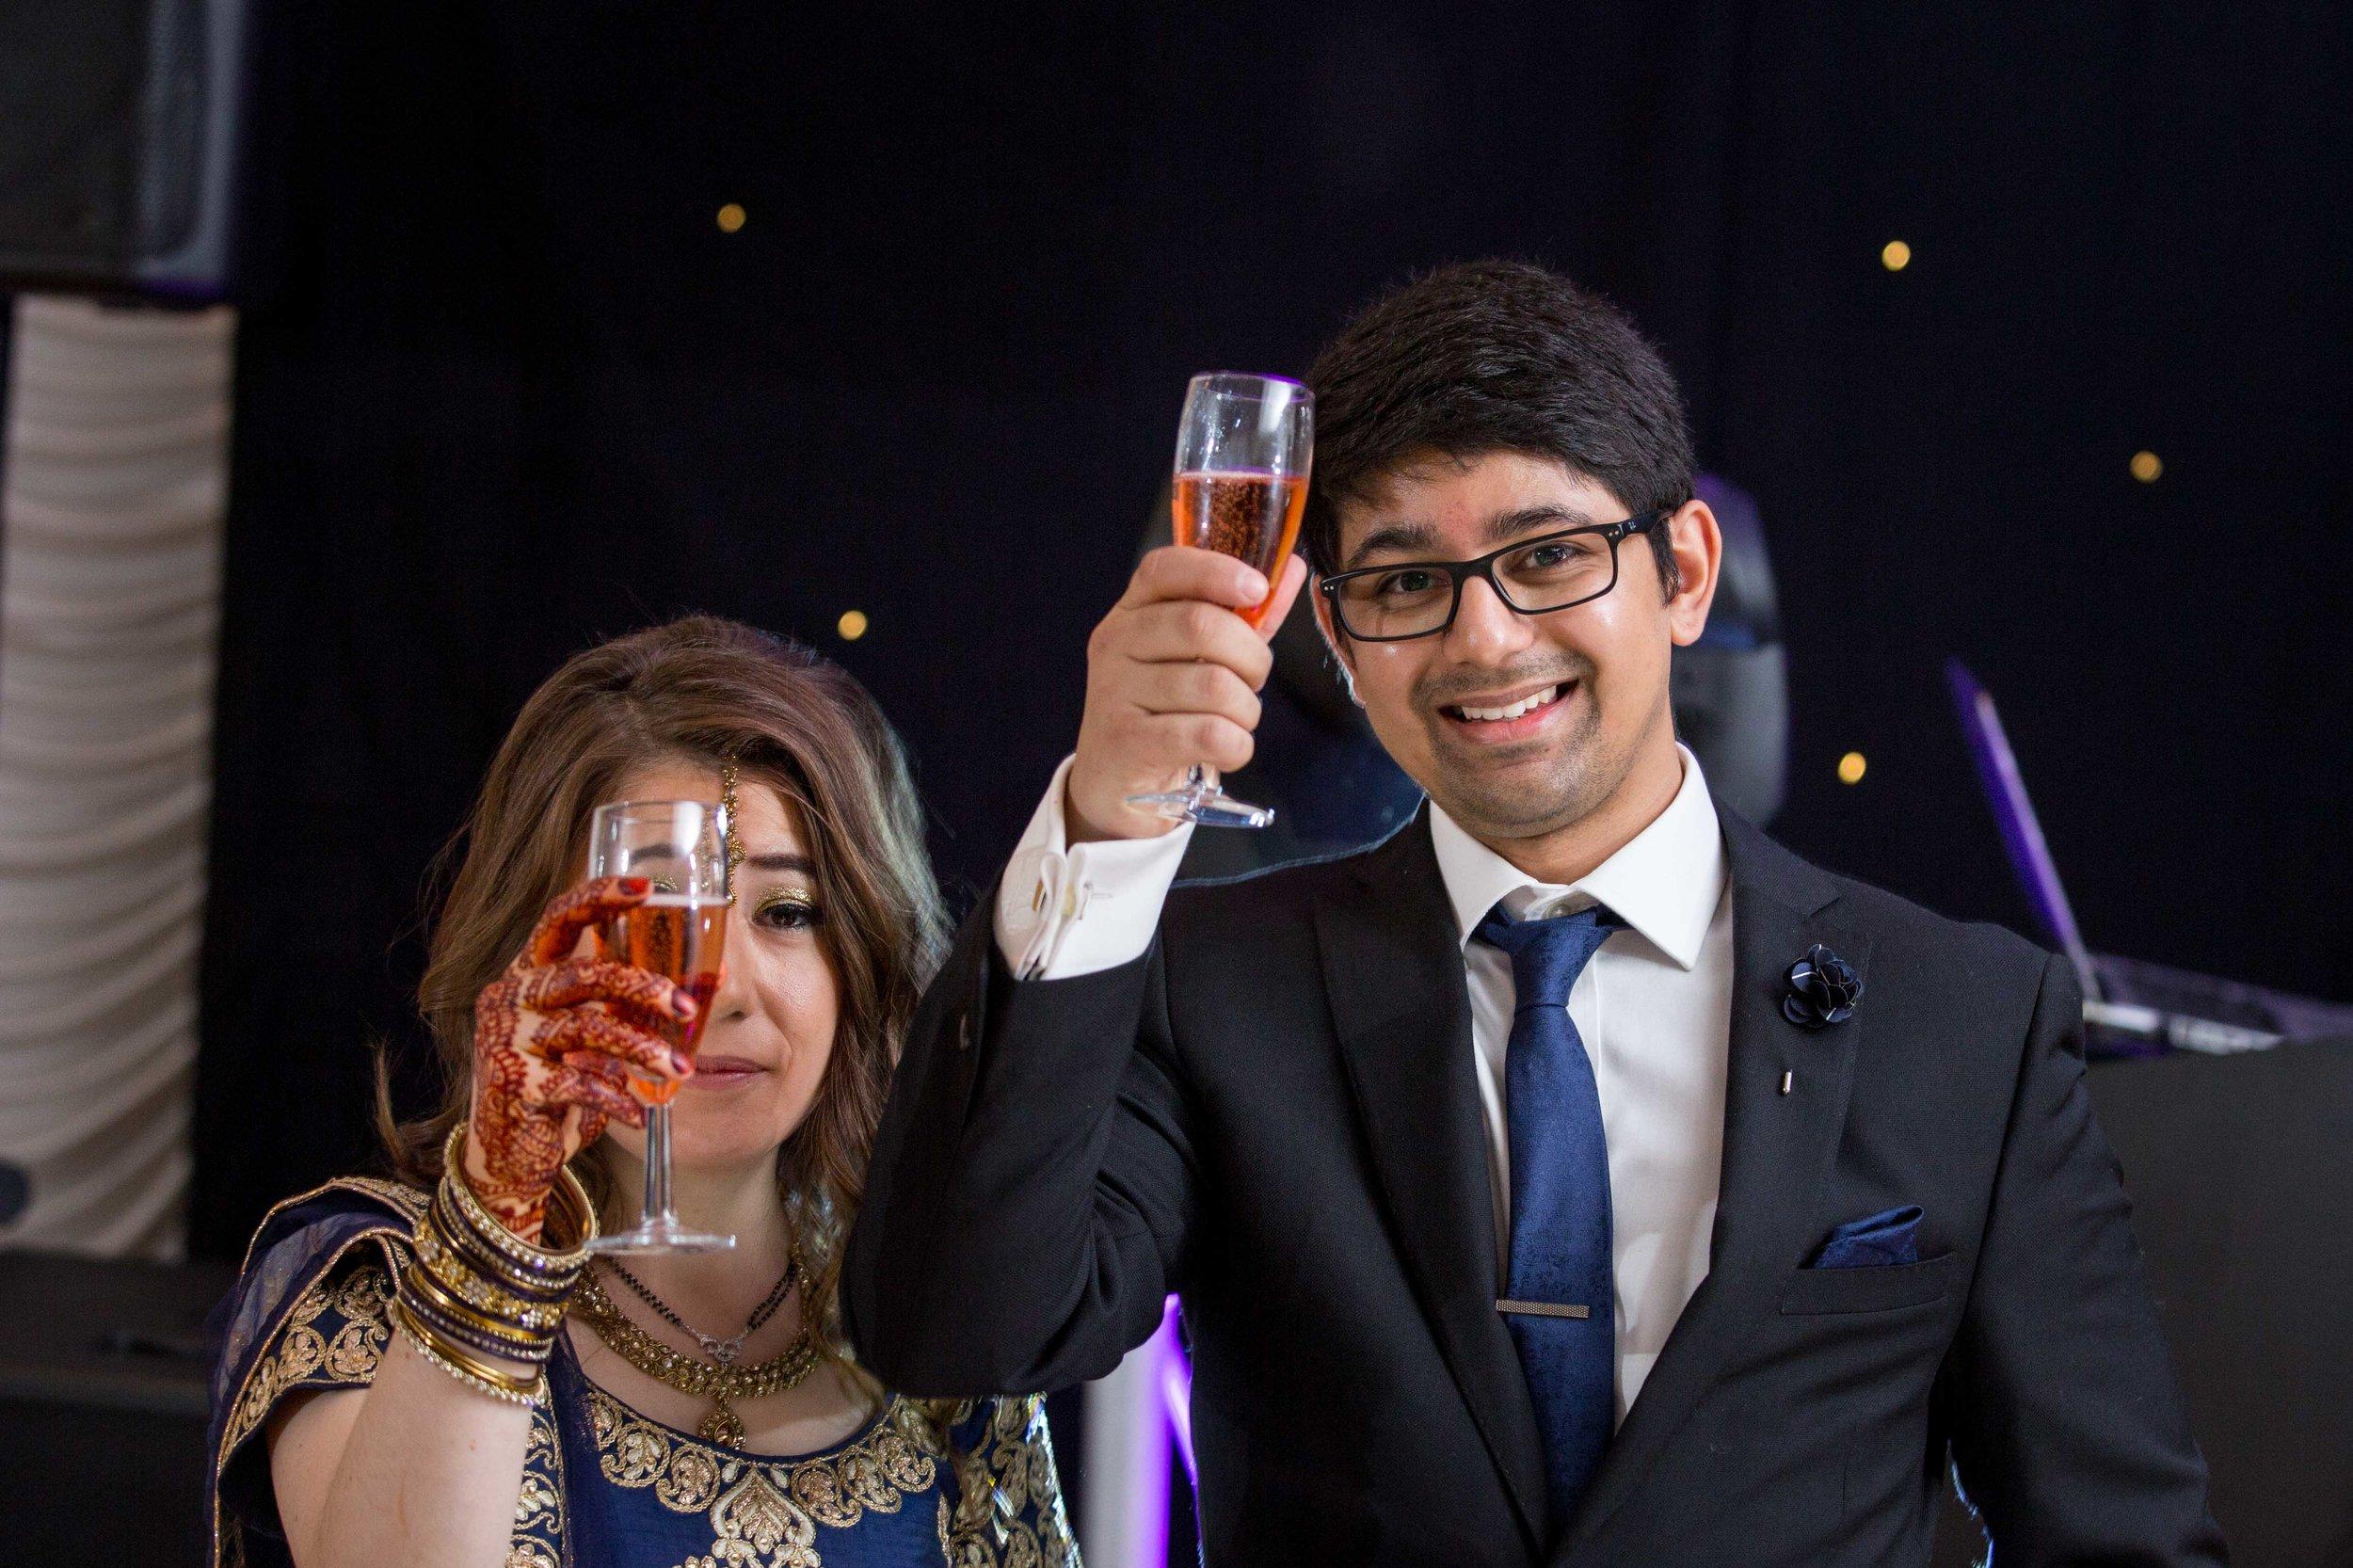 asian-Hindu-wedding-photographer-london-natalia-smith-photography-68.jpg